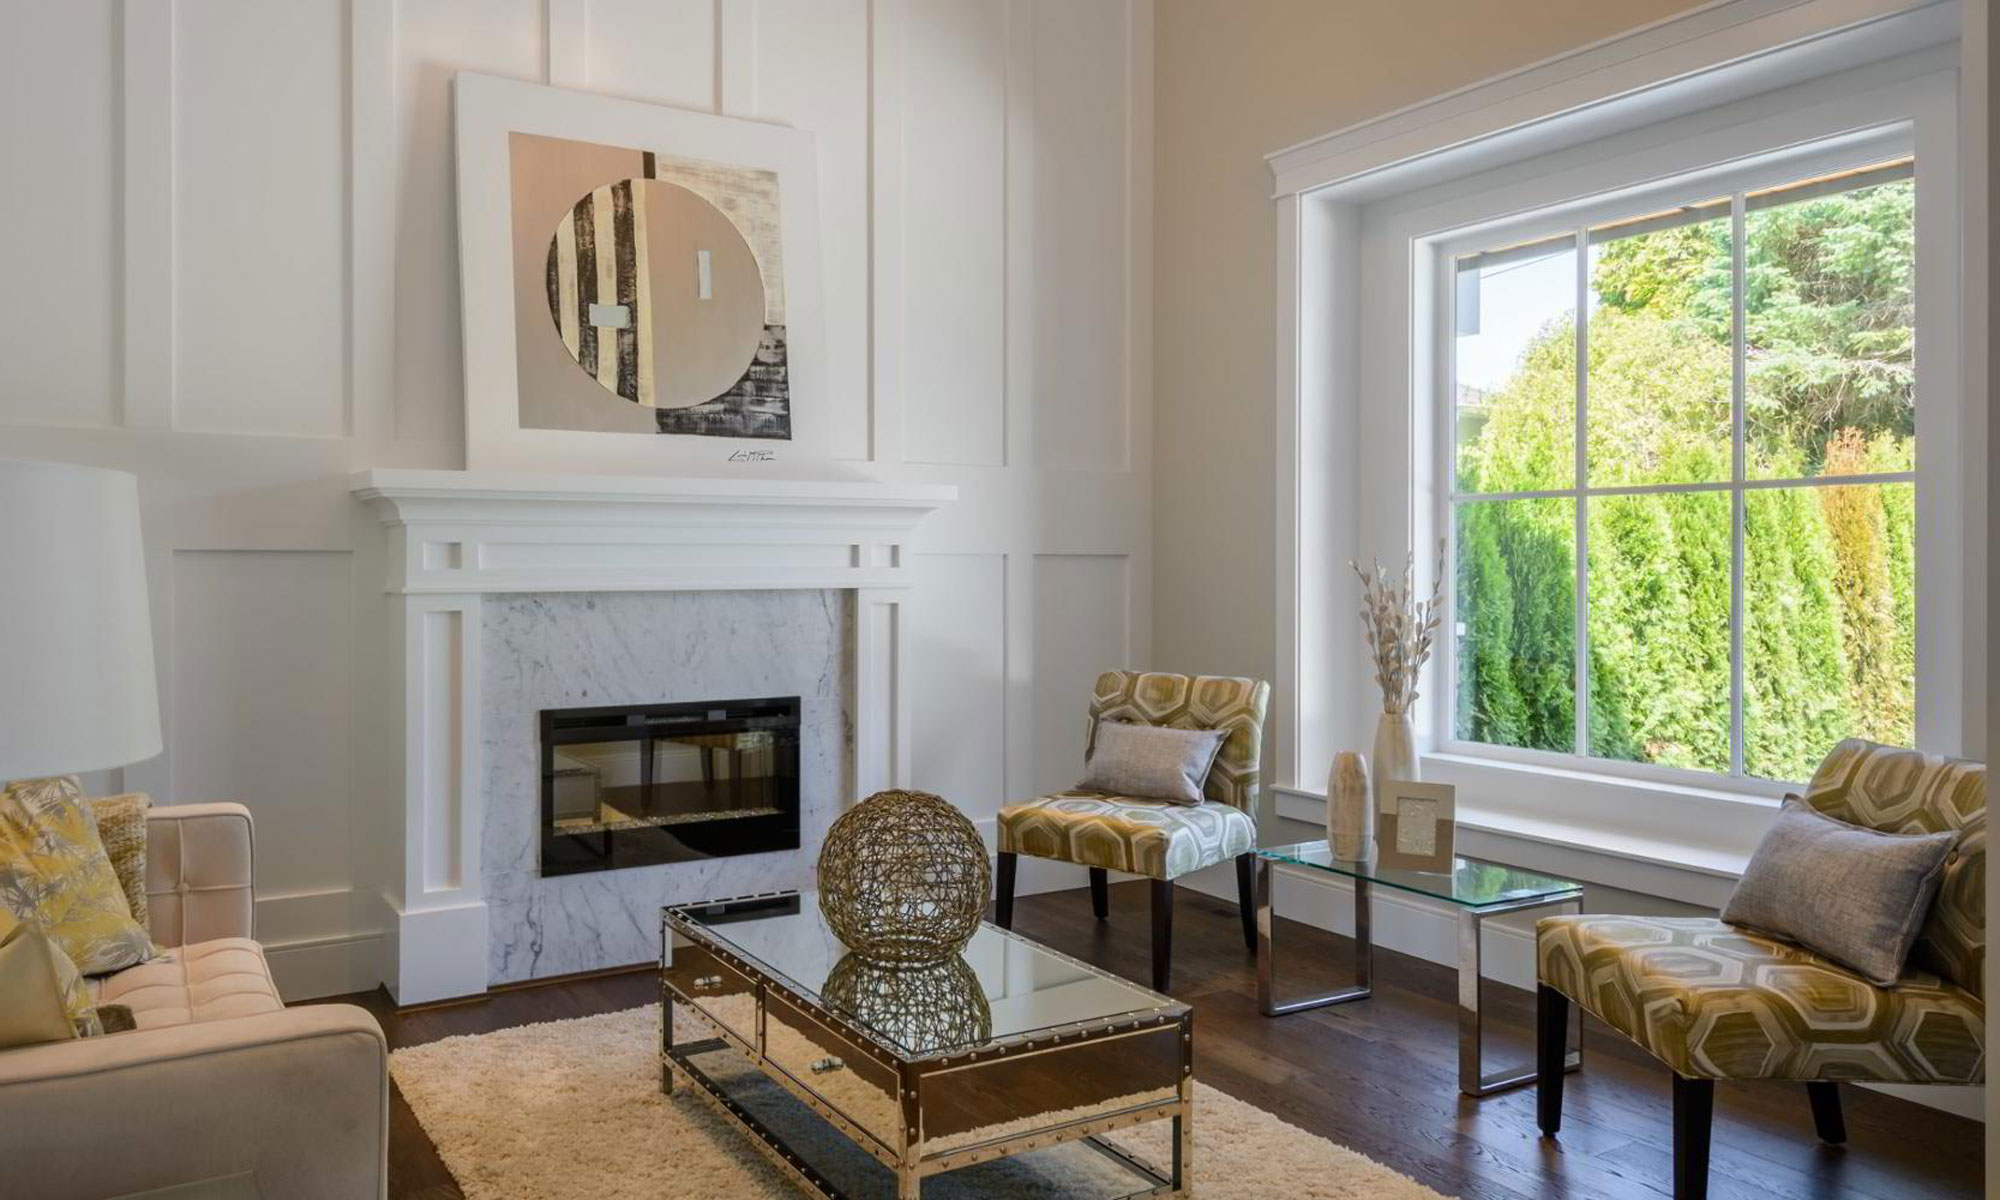 Exclusive interior design for home - Exclusive Interiors